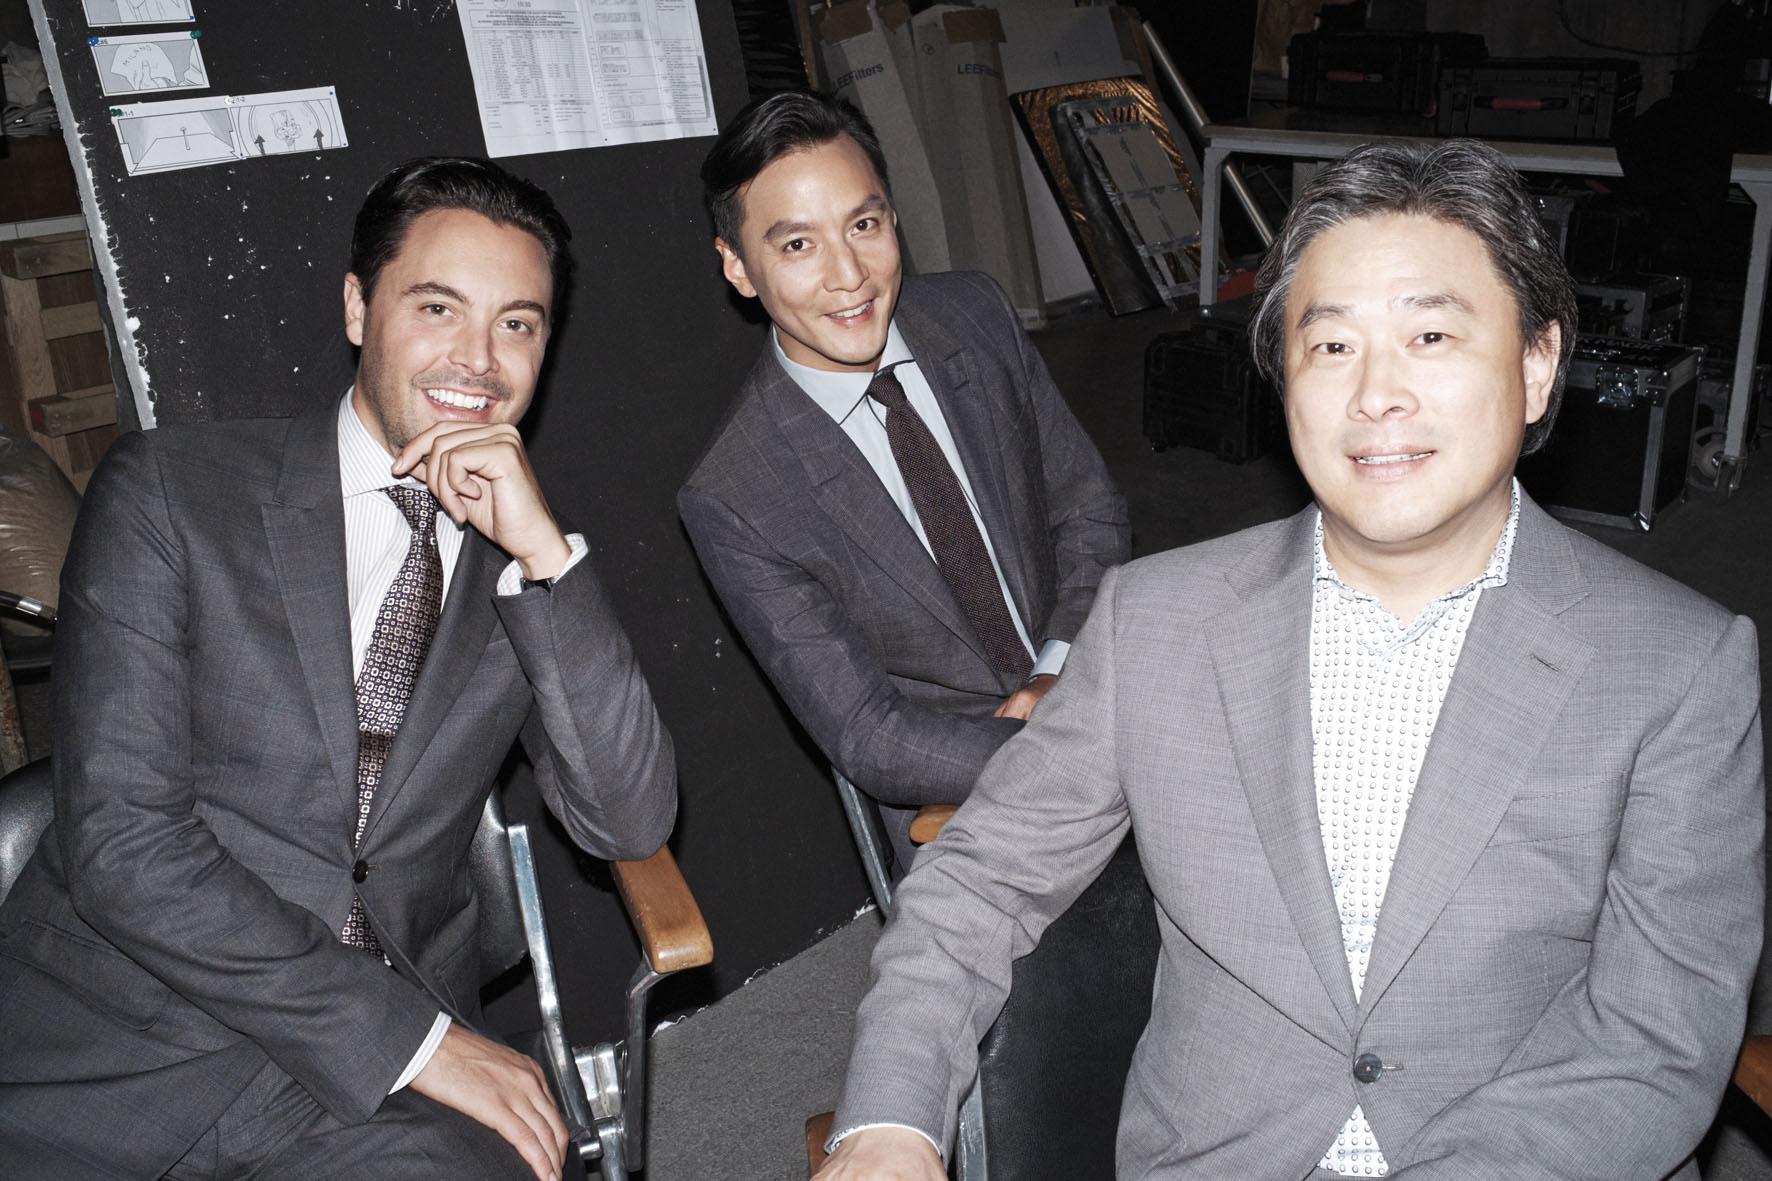 Park Chan-Wook, Jackson Huston and Daniel Wu for  Ermenegildo Zegna   Marco Pietracupa   Ermenegildo Zegna   Numerique Retouch Photo Retouching Studio